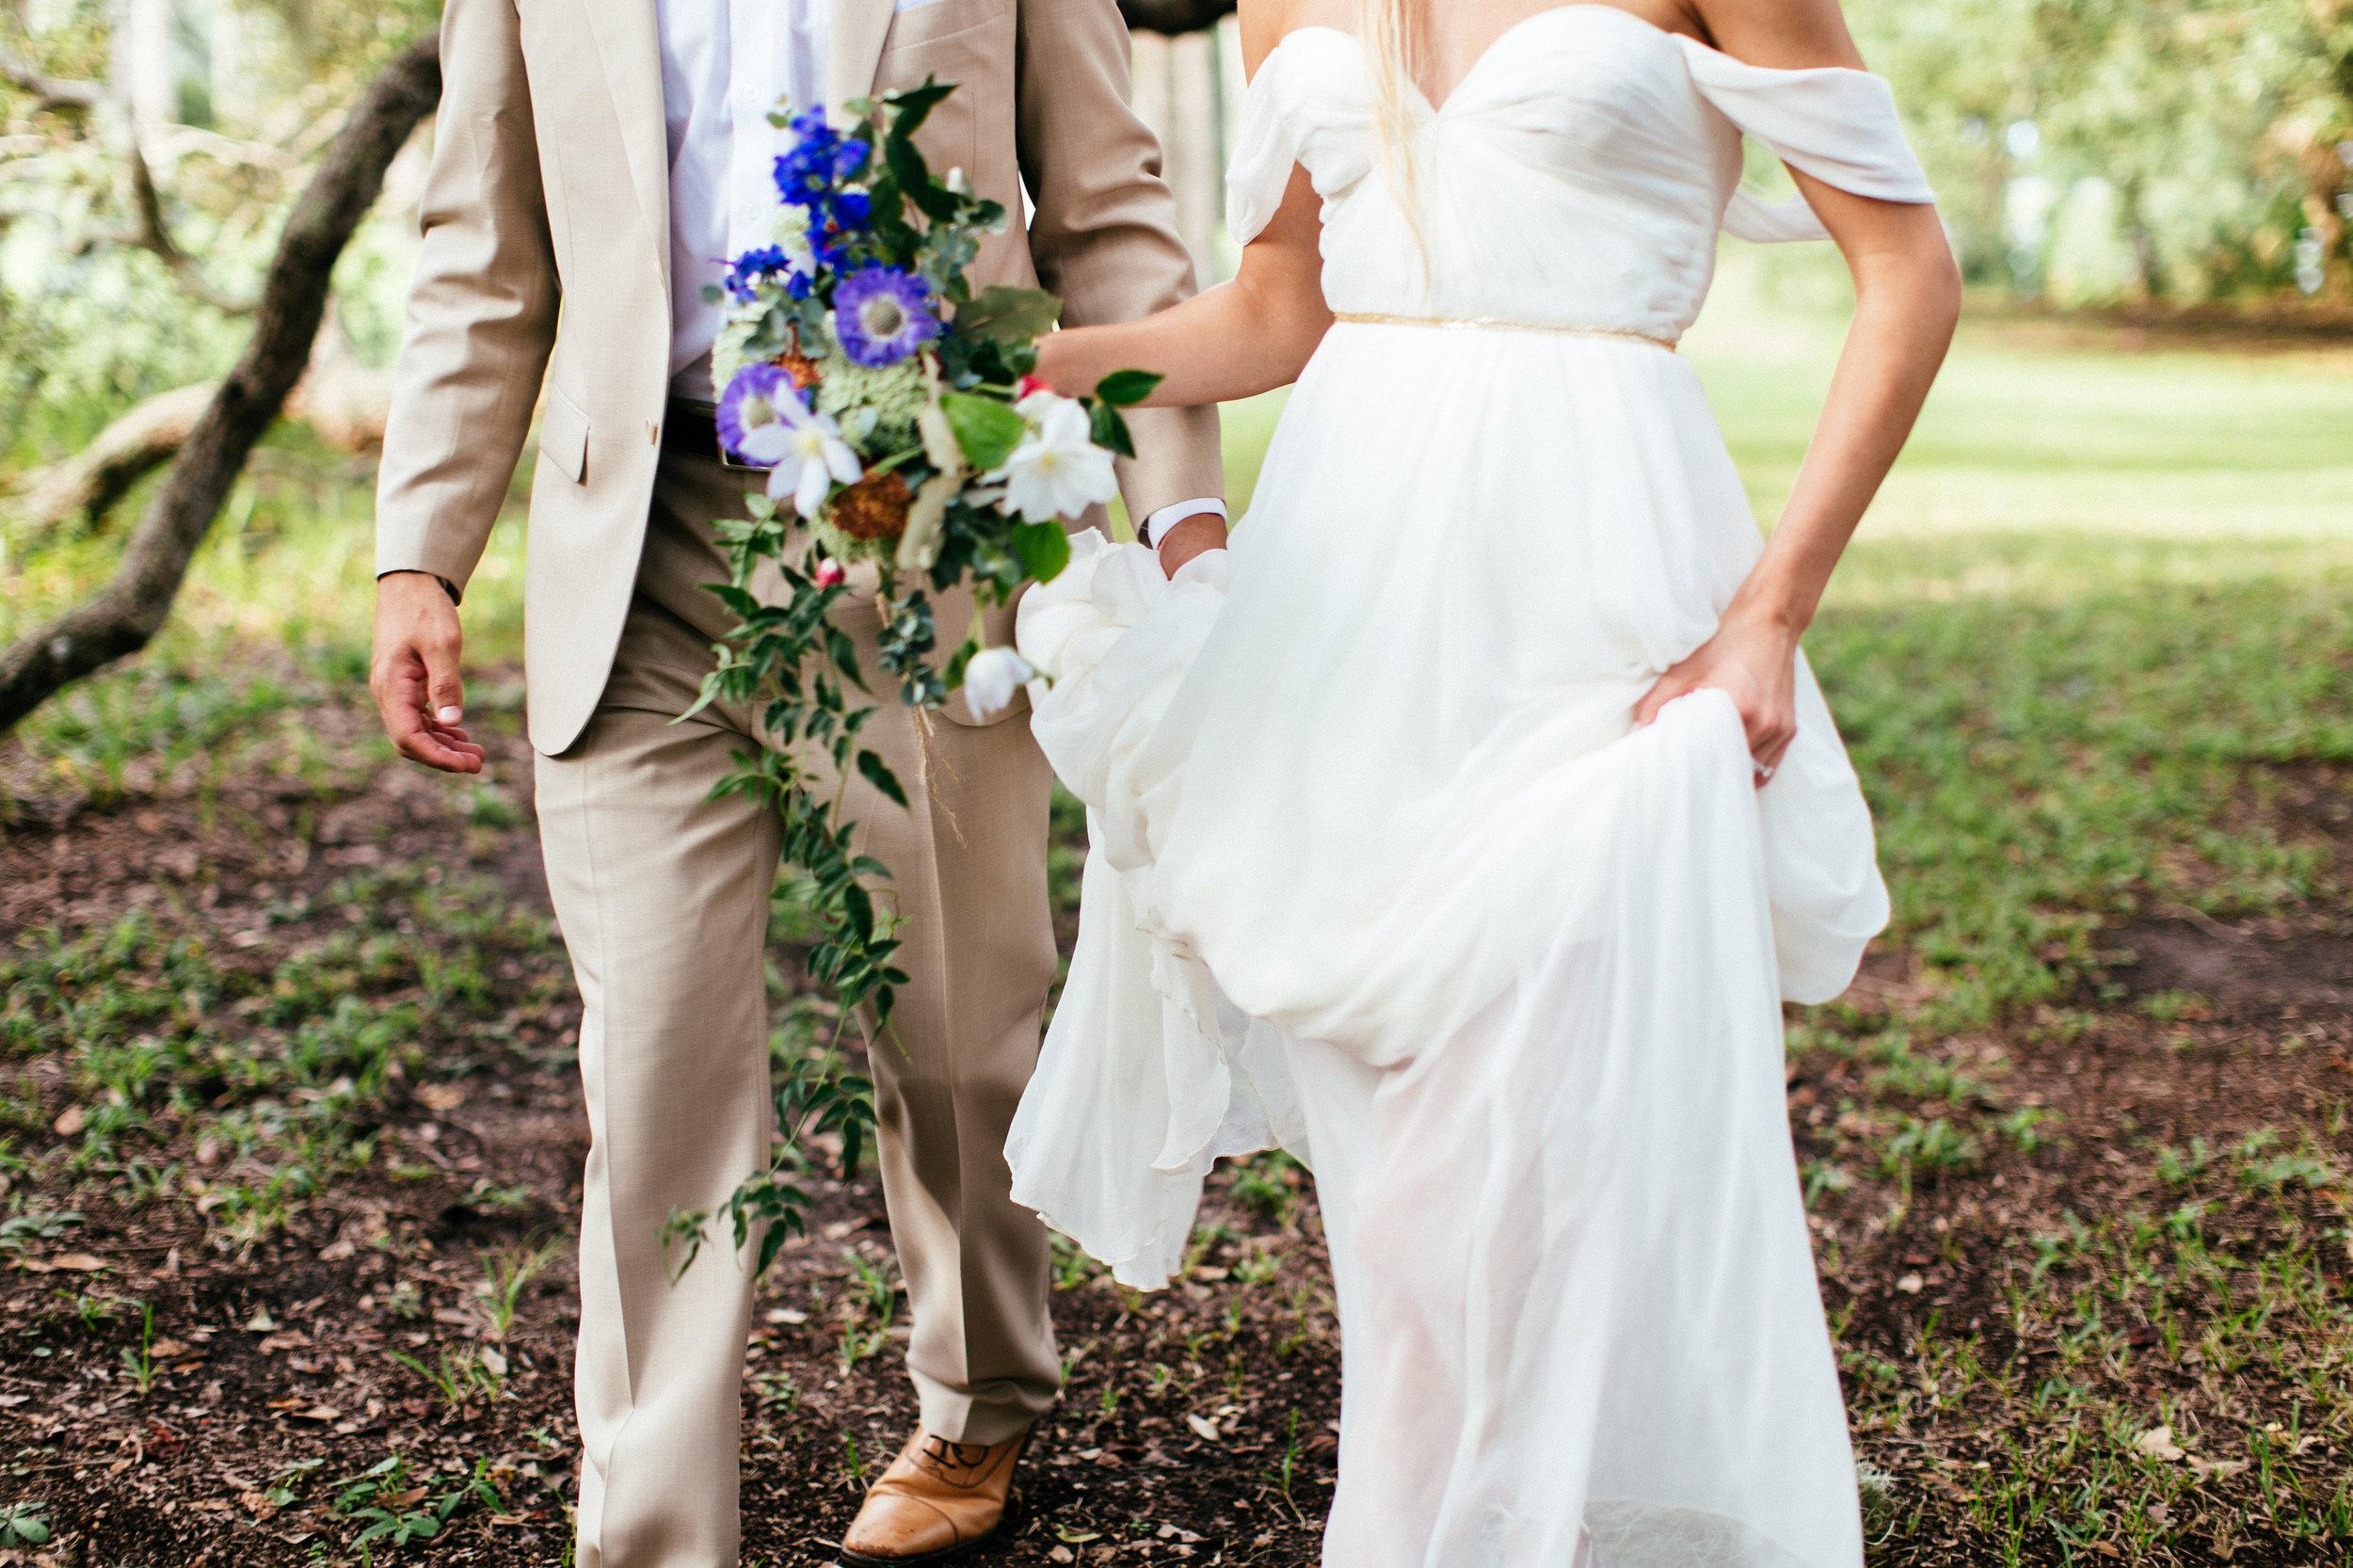 christina-karst-photography-ivory-and-beau-bridal-boutique-sarah-seven-lafayette-boho-bride-boho-bridal-boutique-indie-bridal-boutique-savannah-bridal-boutique-savannah-wedding-dresses-savannah-bridal-gowns-19.jpg